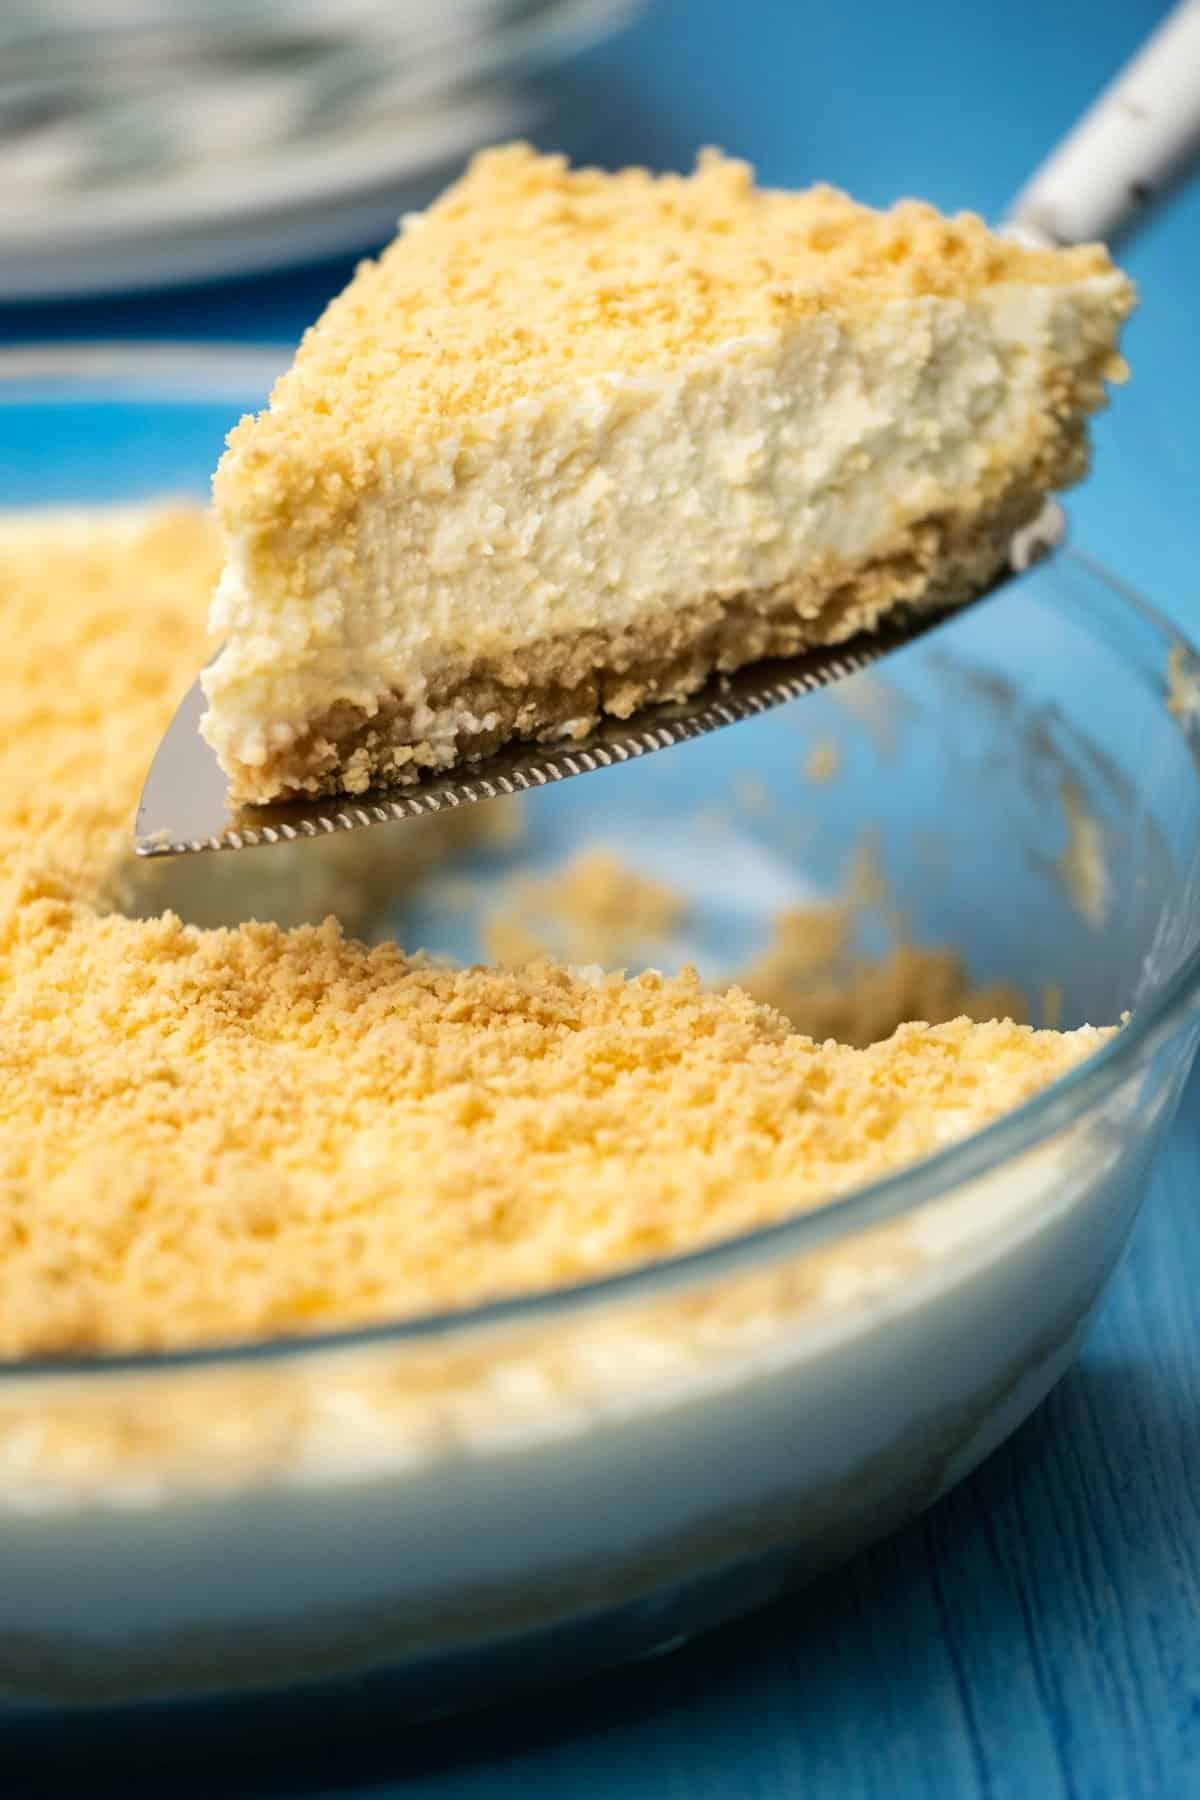 A slice of Greek yogurt cheesecake on a cake lifter.